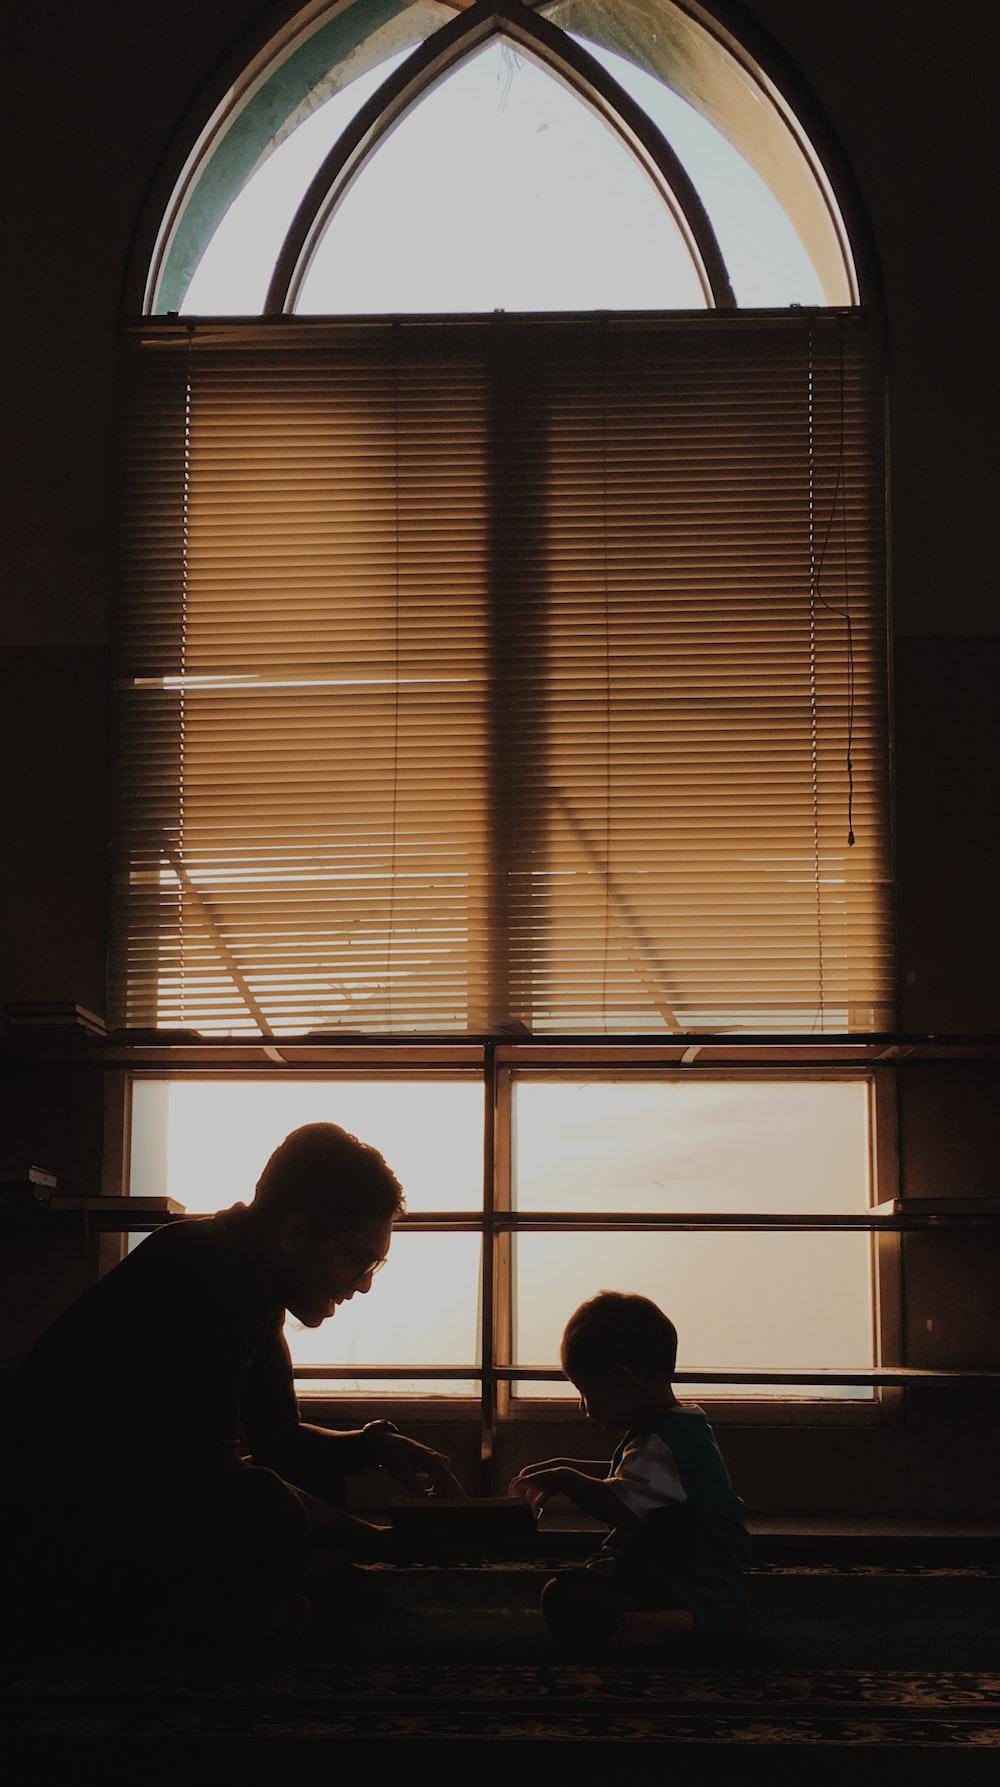 silhouette of man standing near window blinds